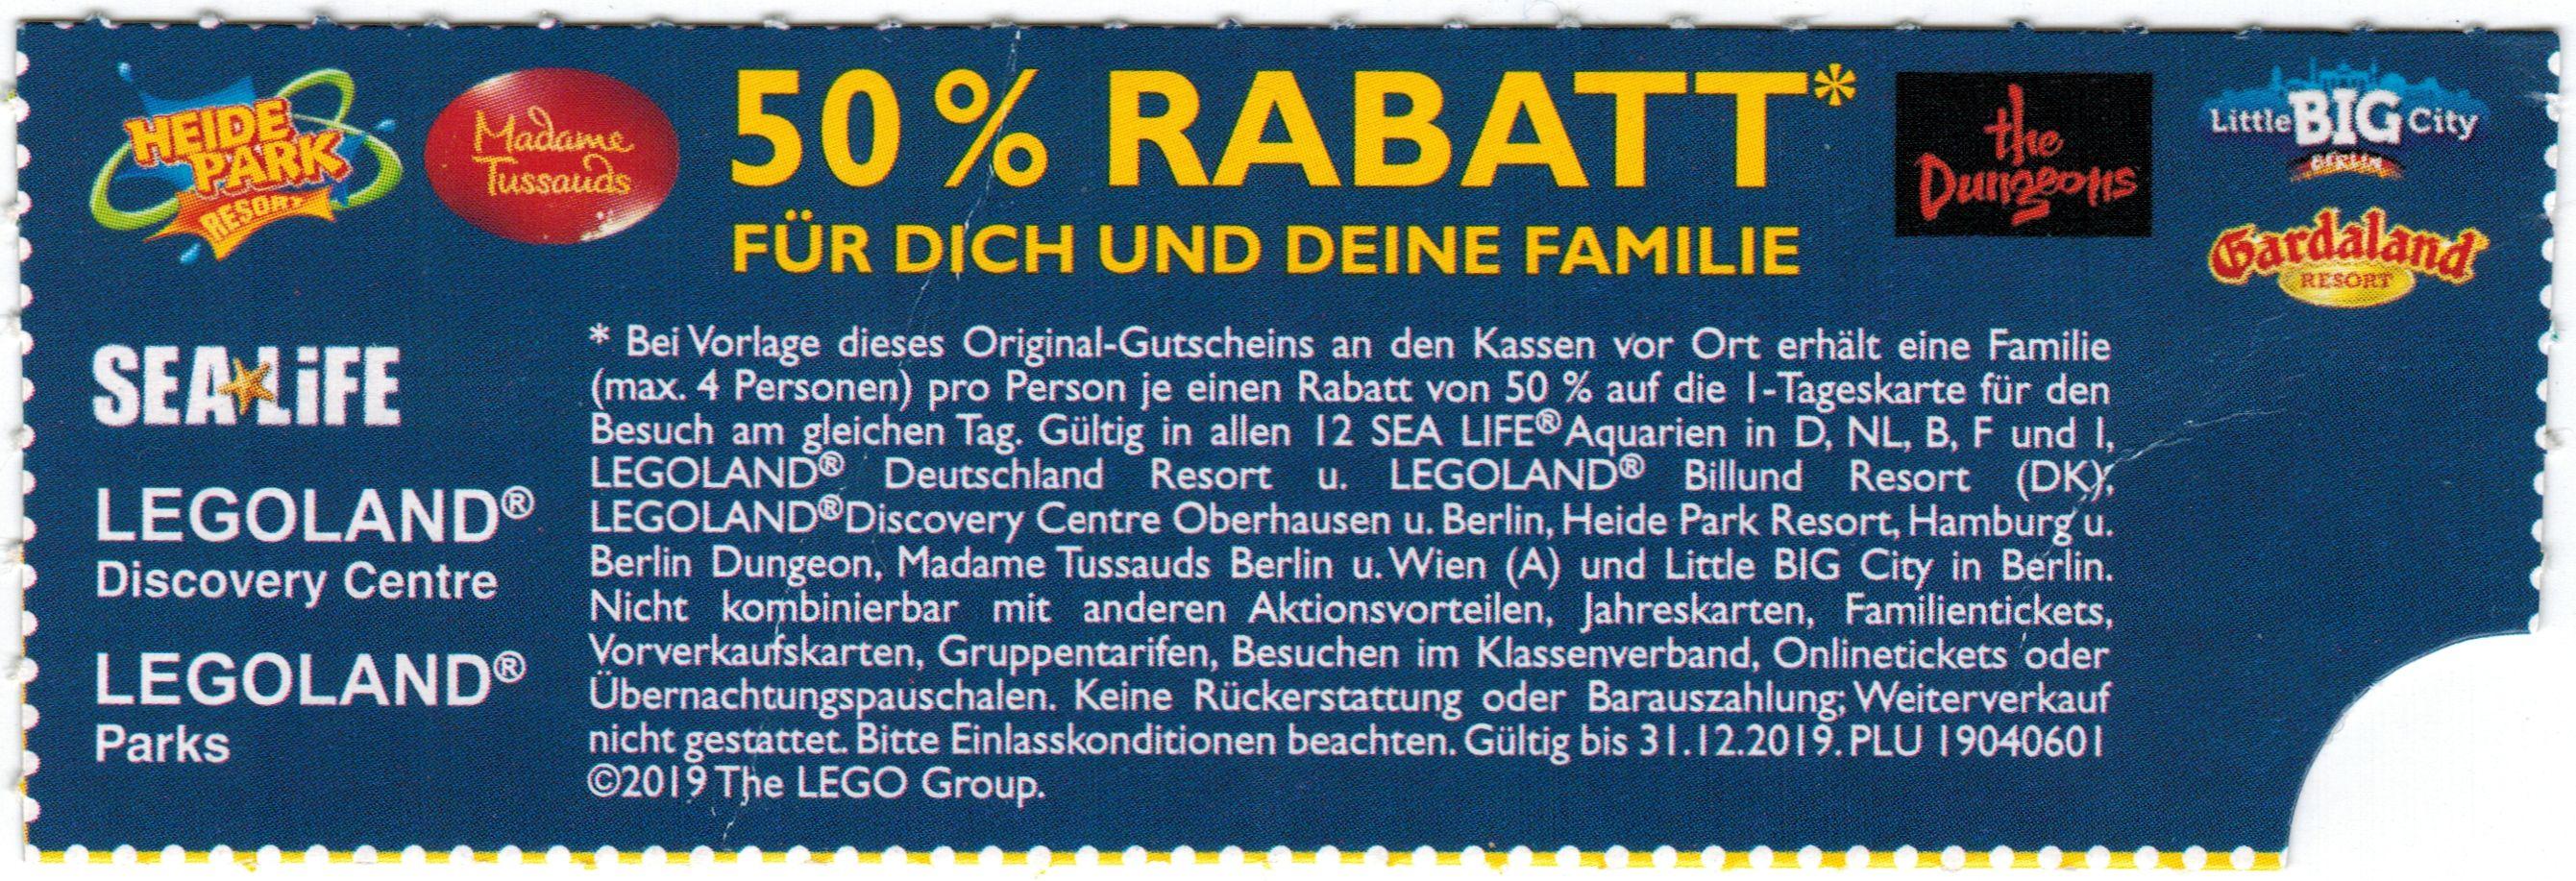 Happy Meal 50% Rabatt für Legoland, Sea Life, Heide Park, ...